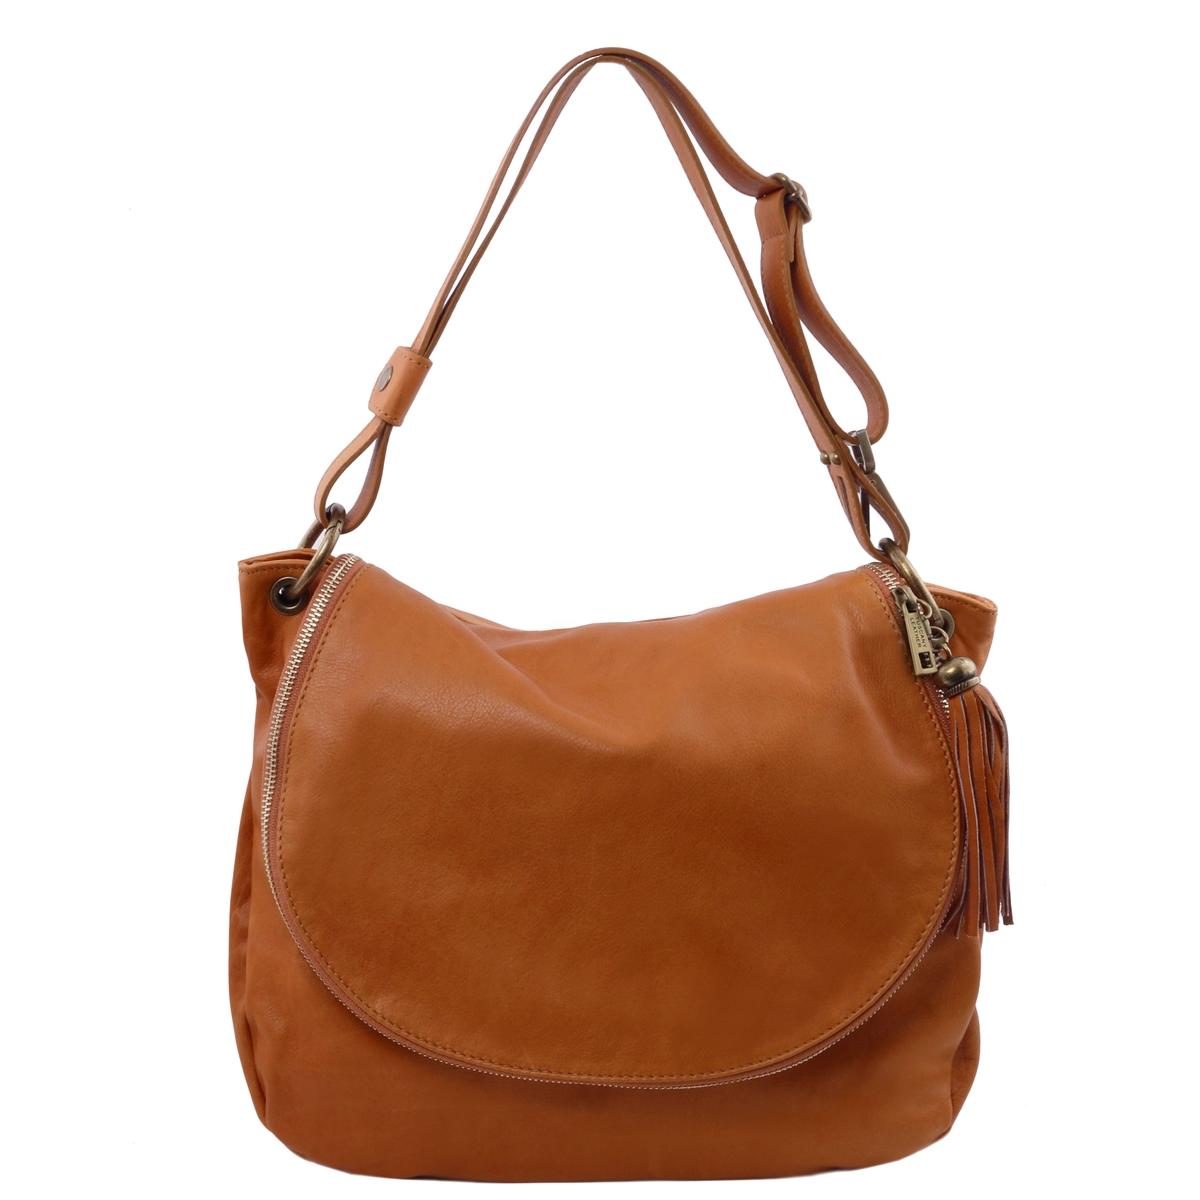 6f06699934b6 Tuscany Leather TL141110 Shoulder Bag - Cognac